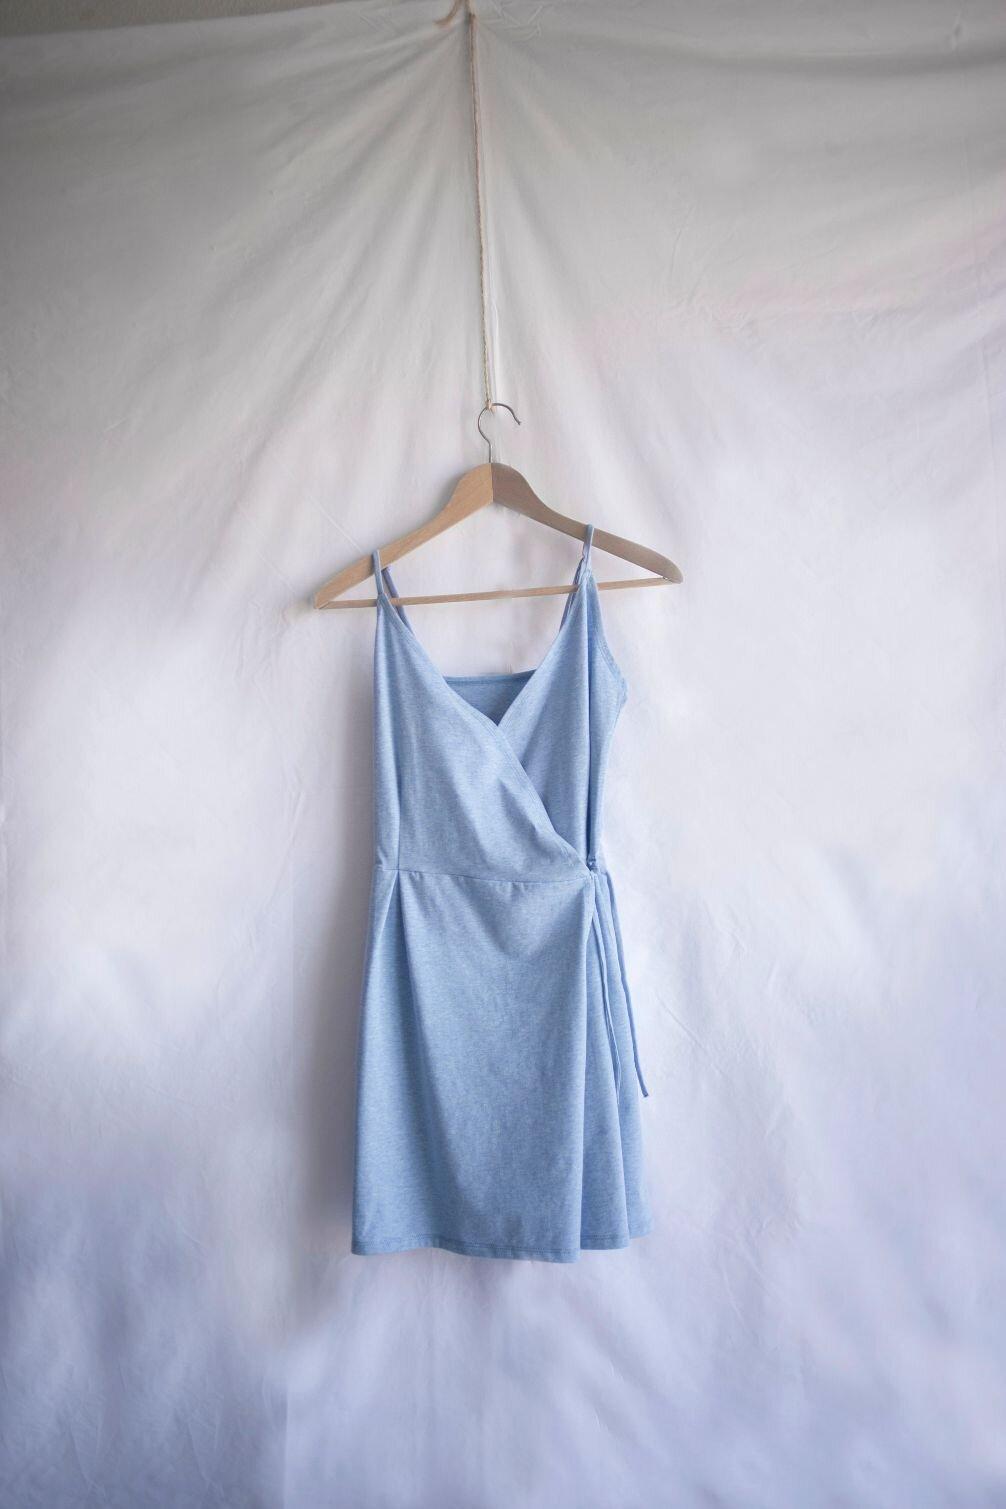 ALETSCH DRESS - SIZ BRAND